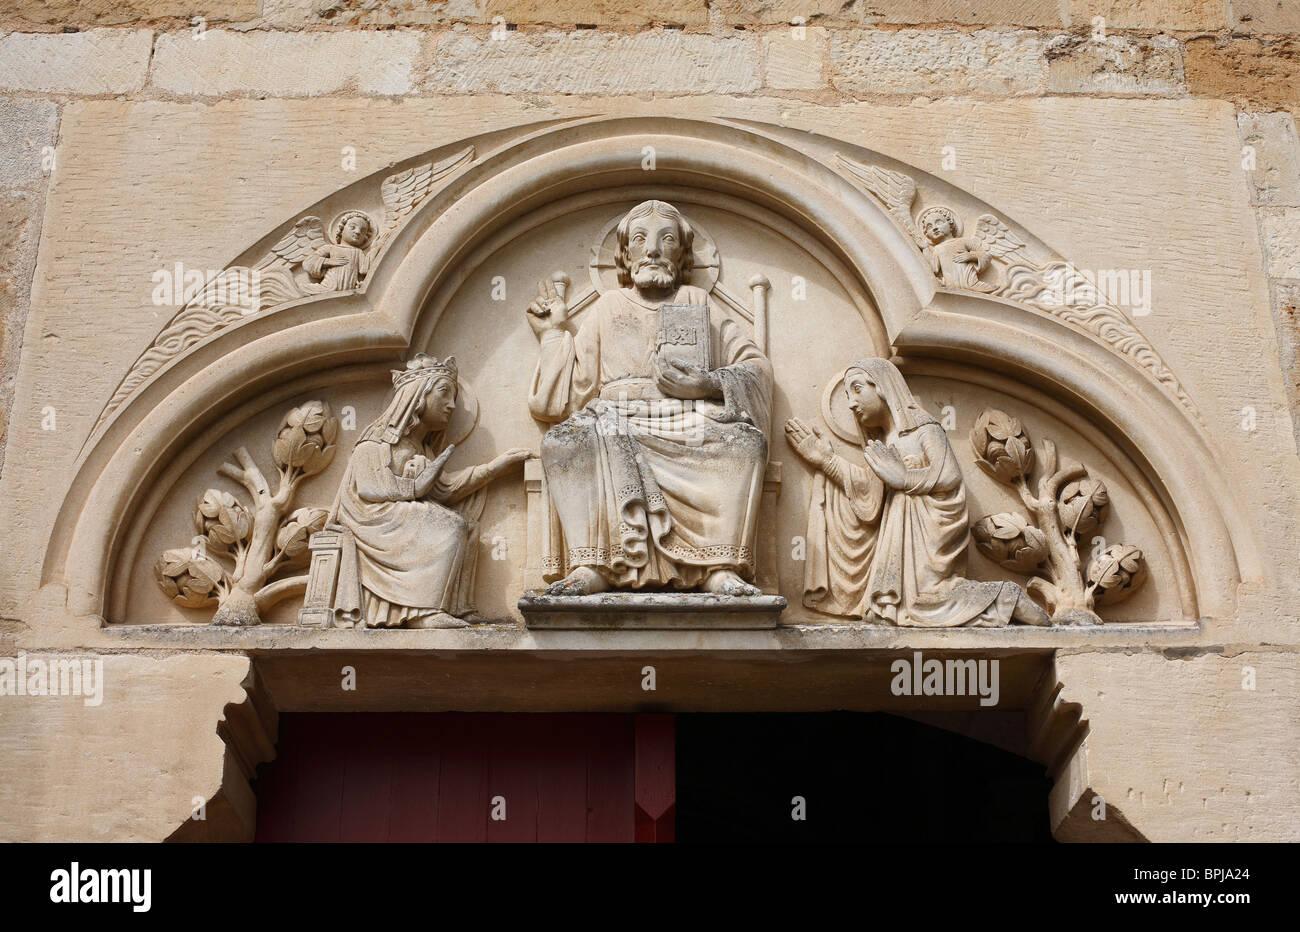 Religious Limestone Carving on the Basilica Sainte Madeleine in Vezelay, Burgundy, France. - Stock Image